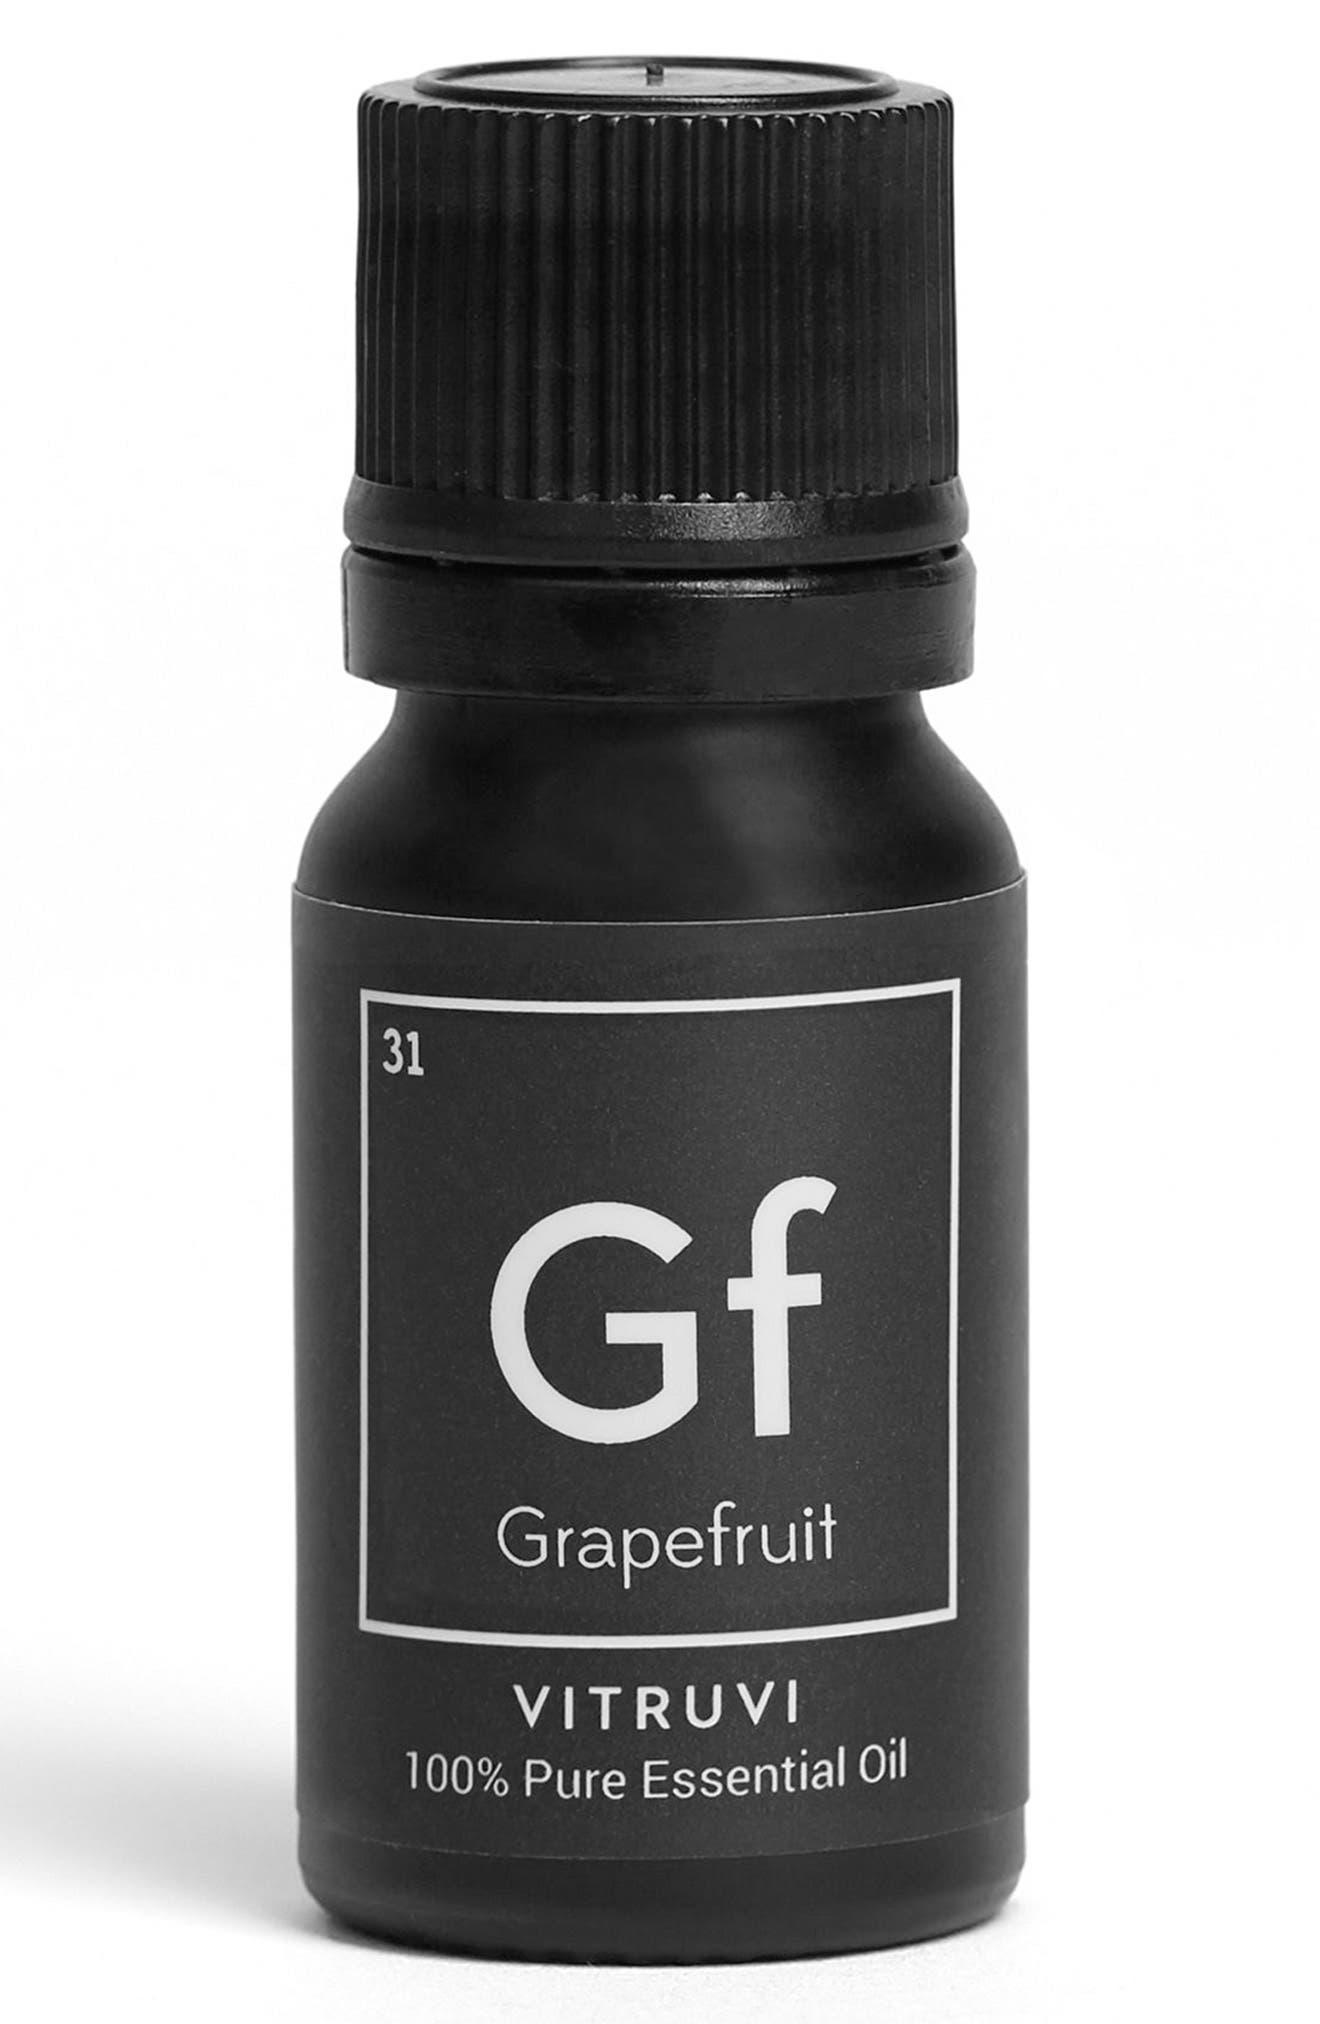 Vitruvi Grapefruit Essential Oil